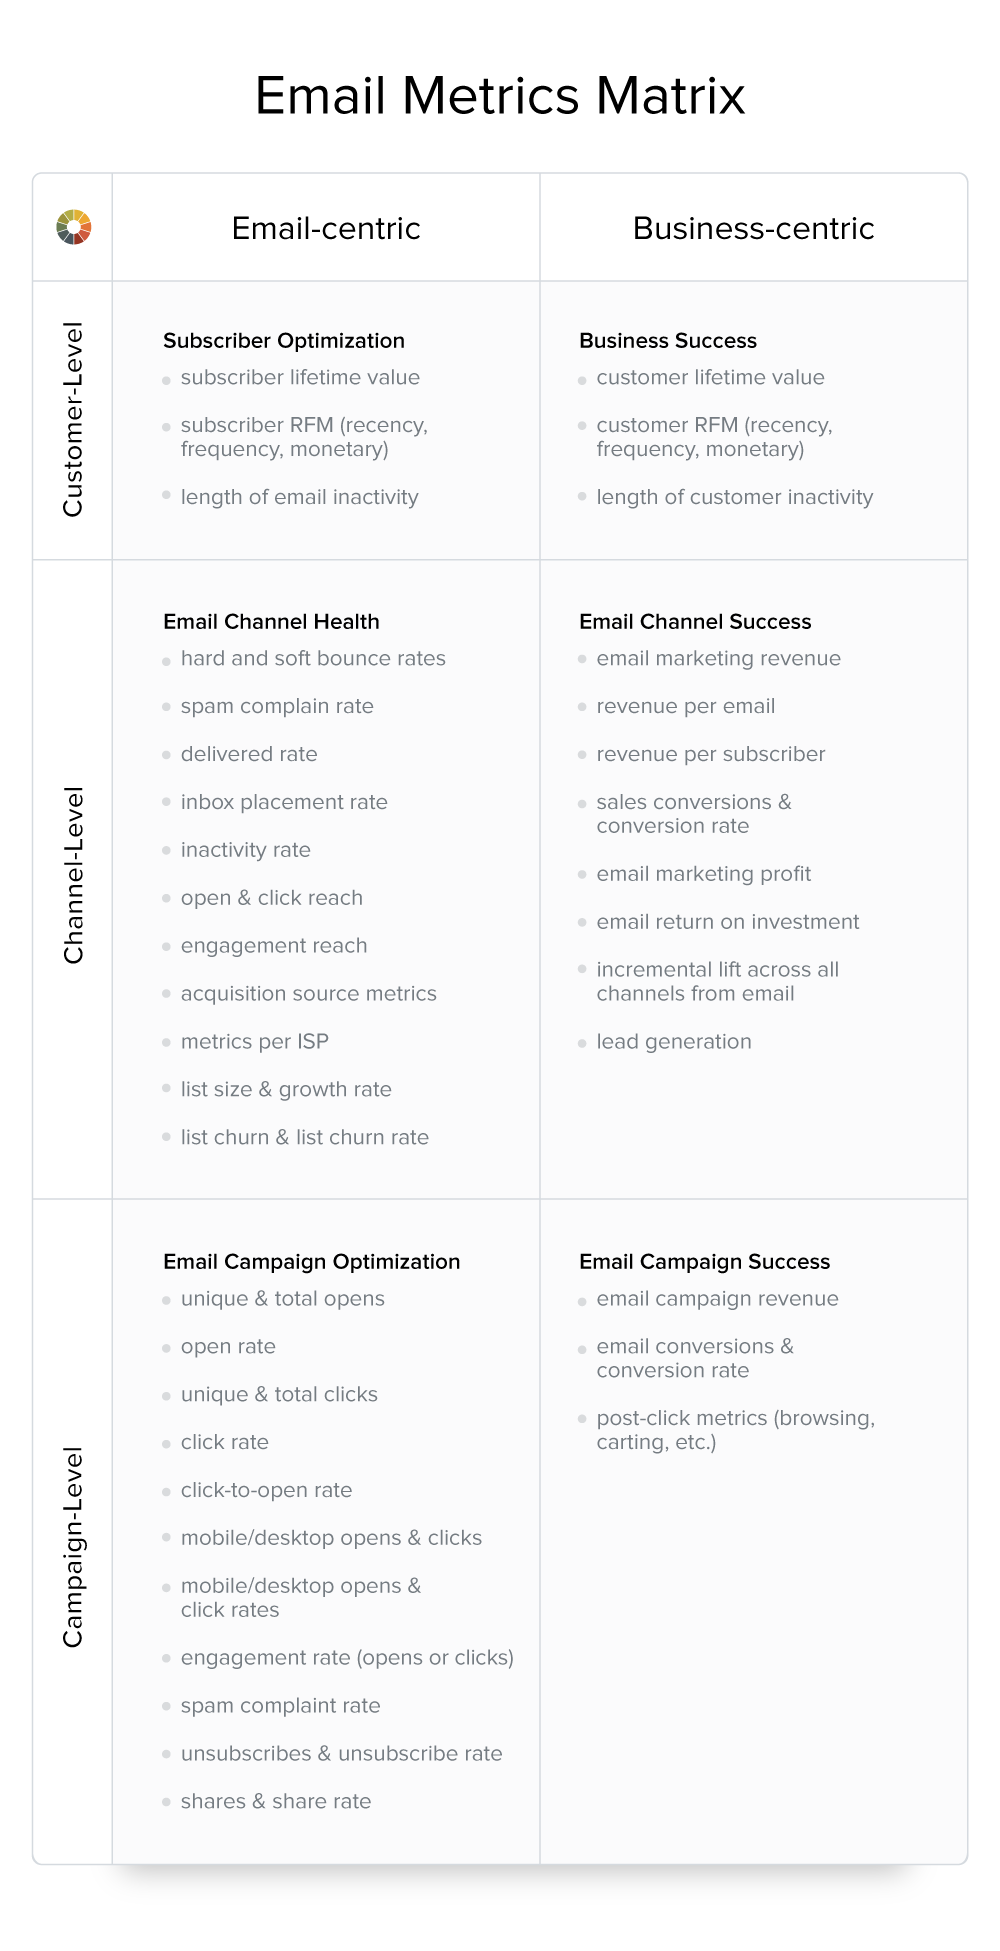 email-metrics-matrix